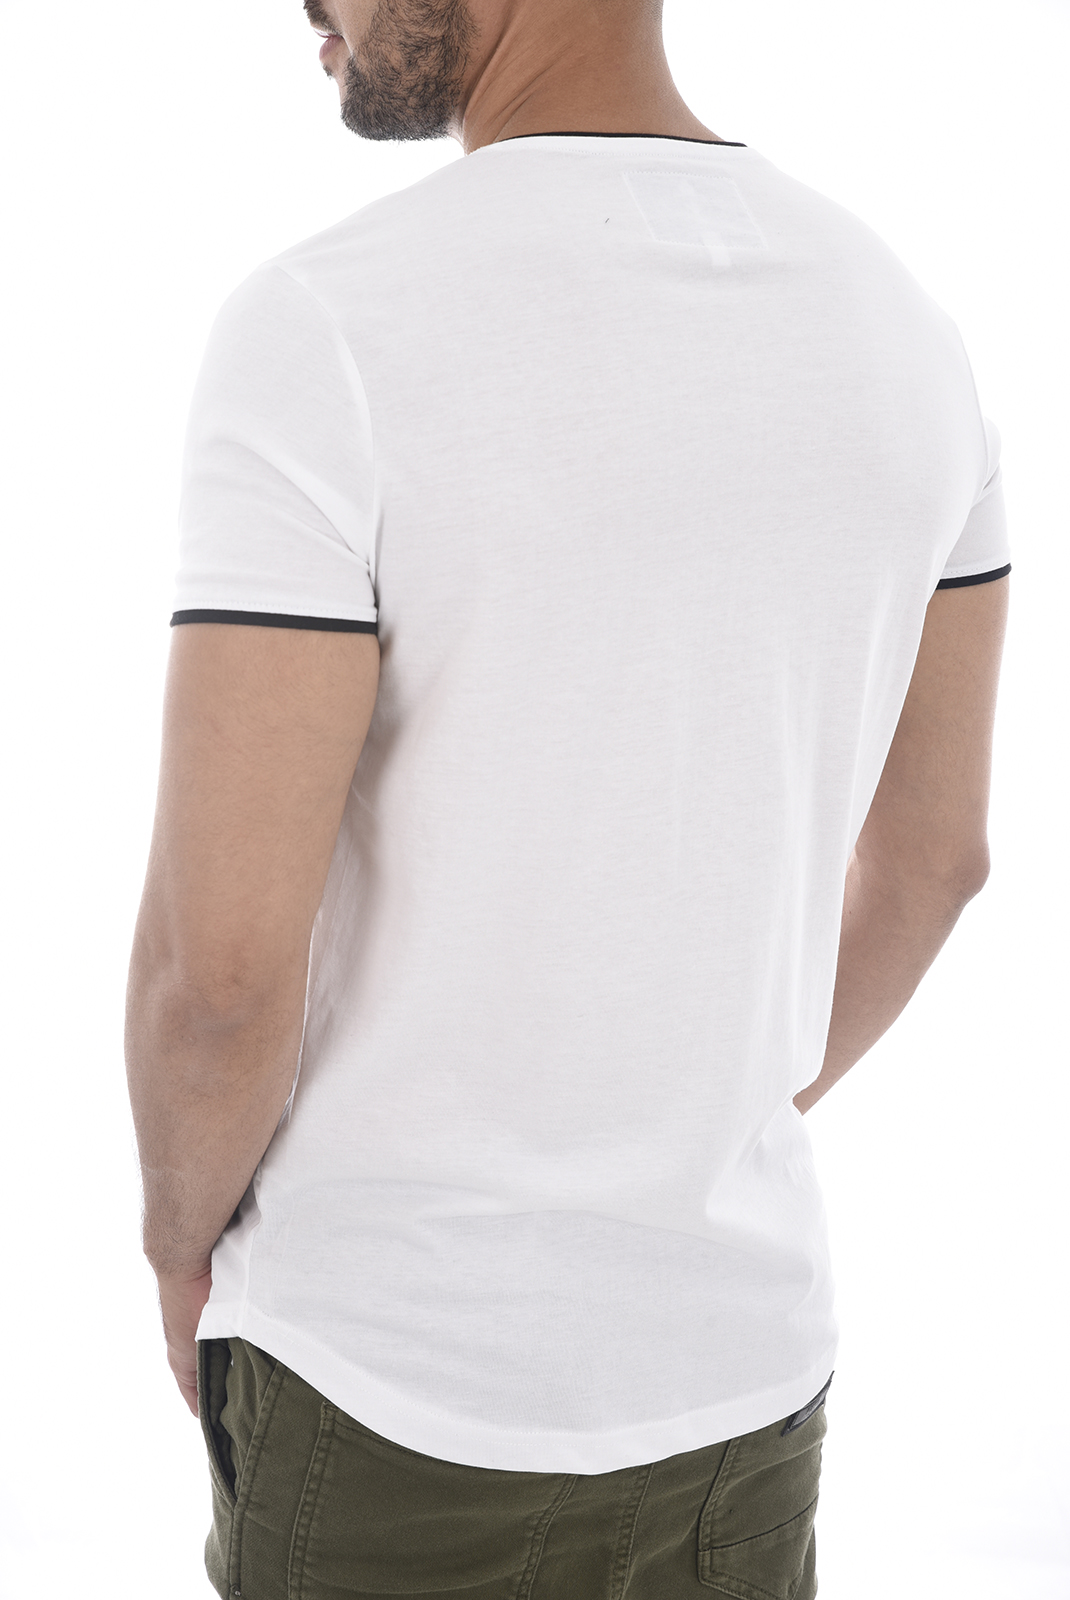 Tee-shirts  Hite couture MEZIER BLANC